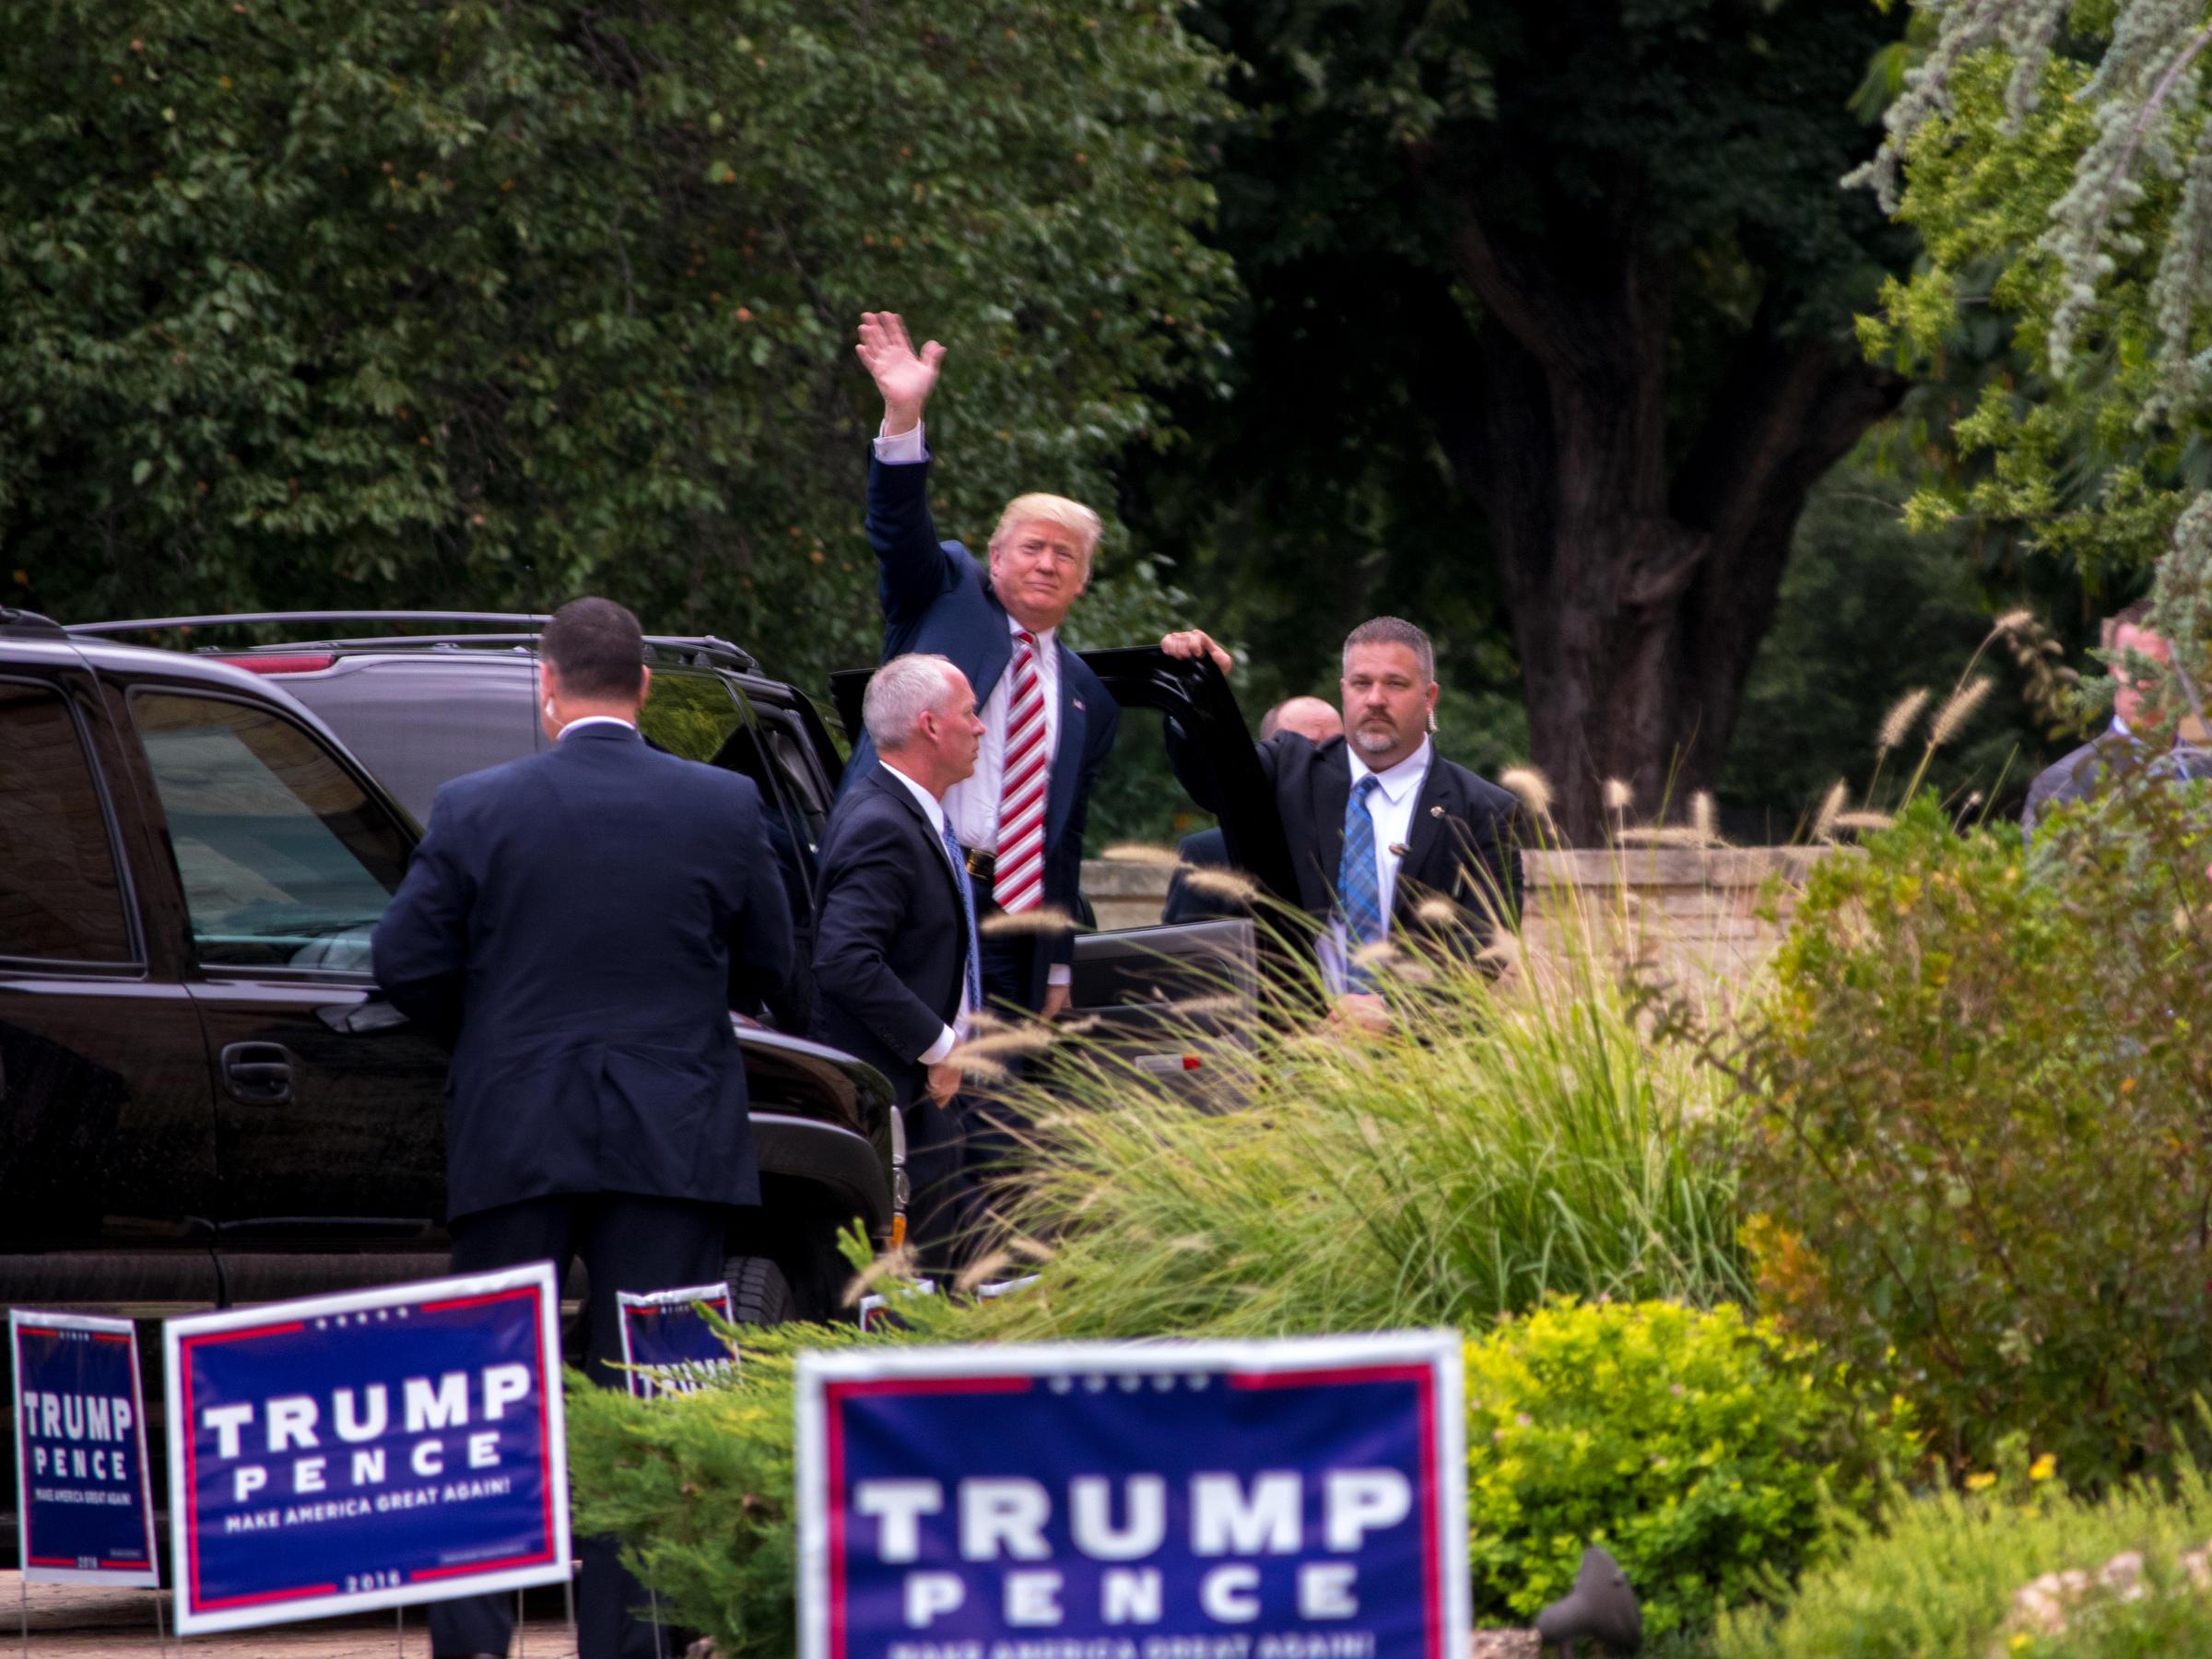 SLIDESHOW Dozens Protest Trumps Norman Fundraiser Before Heavy